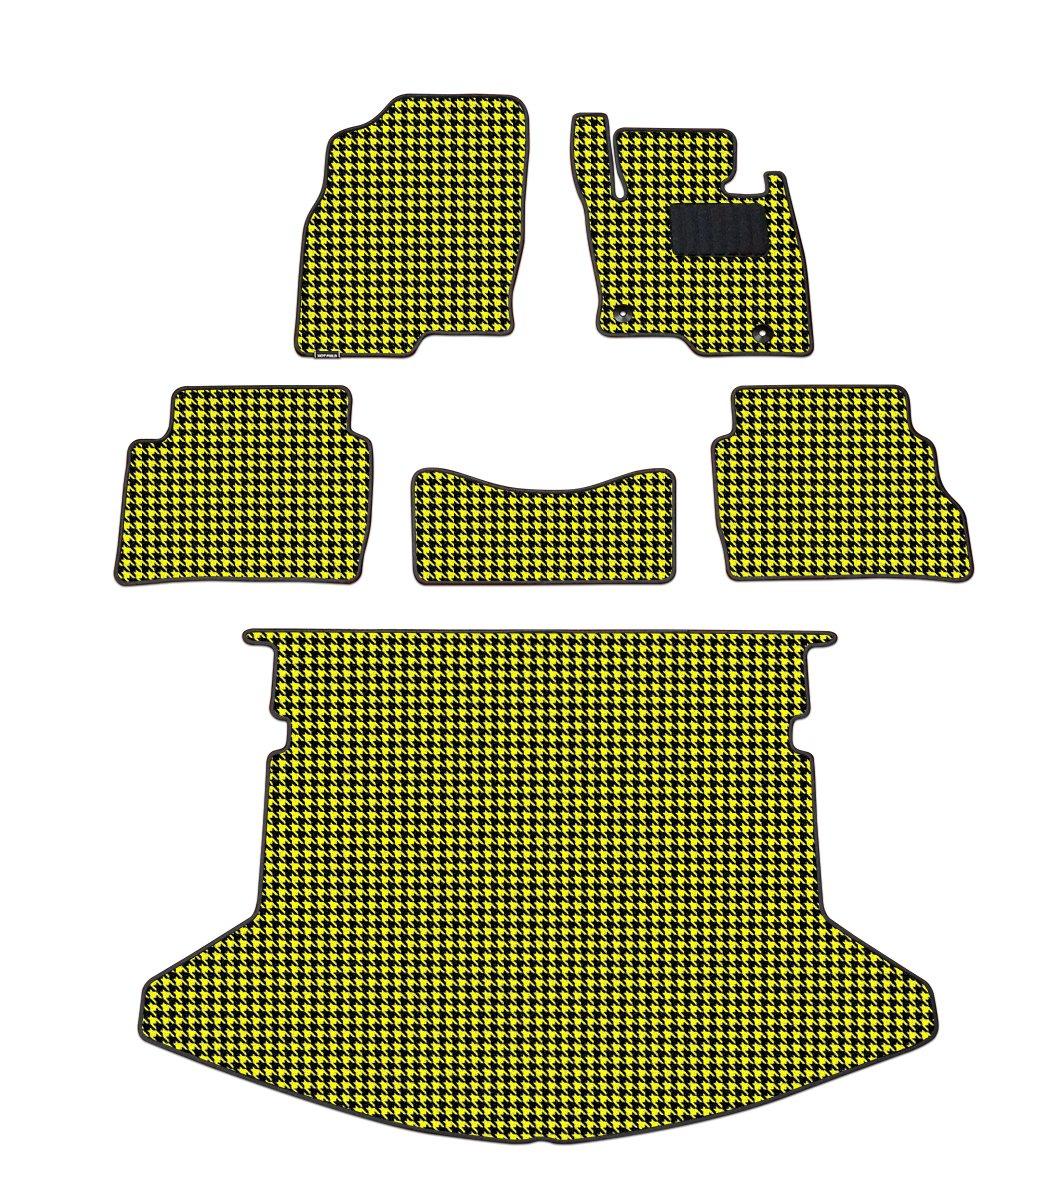 Hotfield マツダ CX-5 フロアマット+トランクマット 千鳥イエロー KF系 (2017年2月~)/フットレスト一体形状 B00TQPZPG4 KF系 (2017年2月~)/フットレスト一体形状|千鳥イエロー 千鳥イエロー KF系 (2017年2月~)/フットレスト一体形状